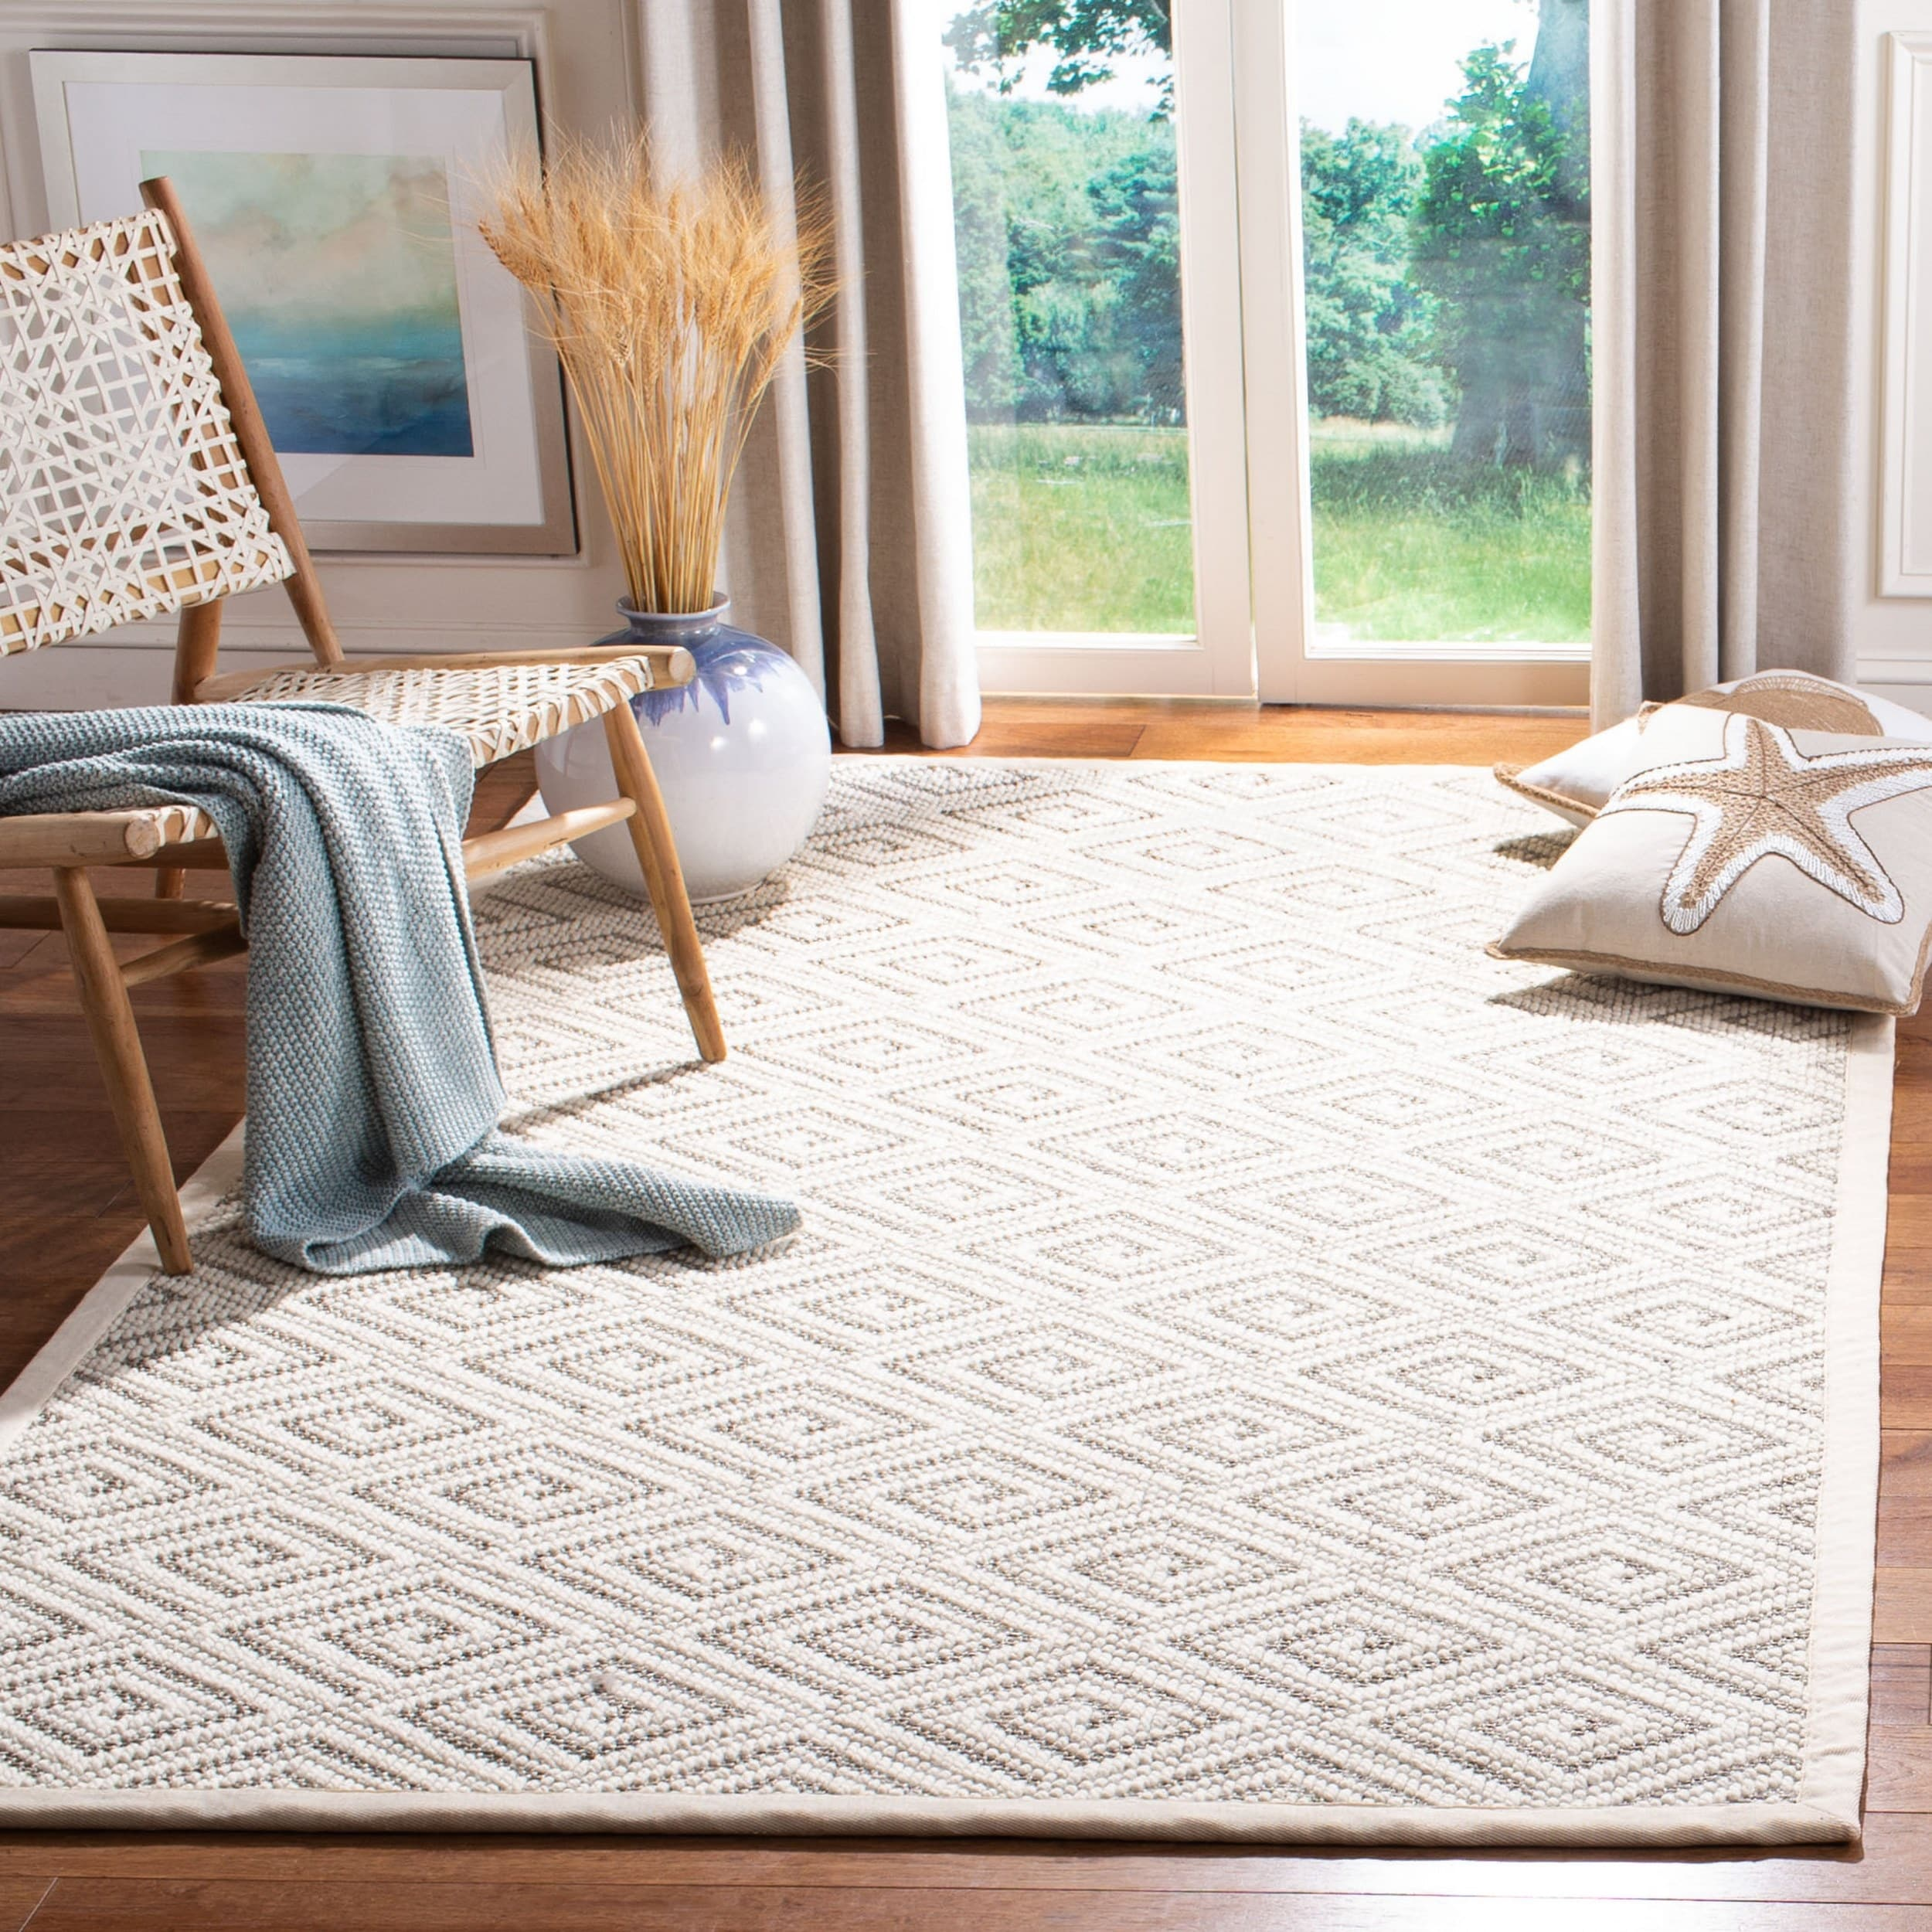 Safavieh Handmade Palm Beach Modern Contemporary Geometric Sisal Rug Overstock 27793265